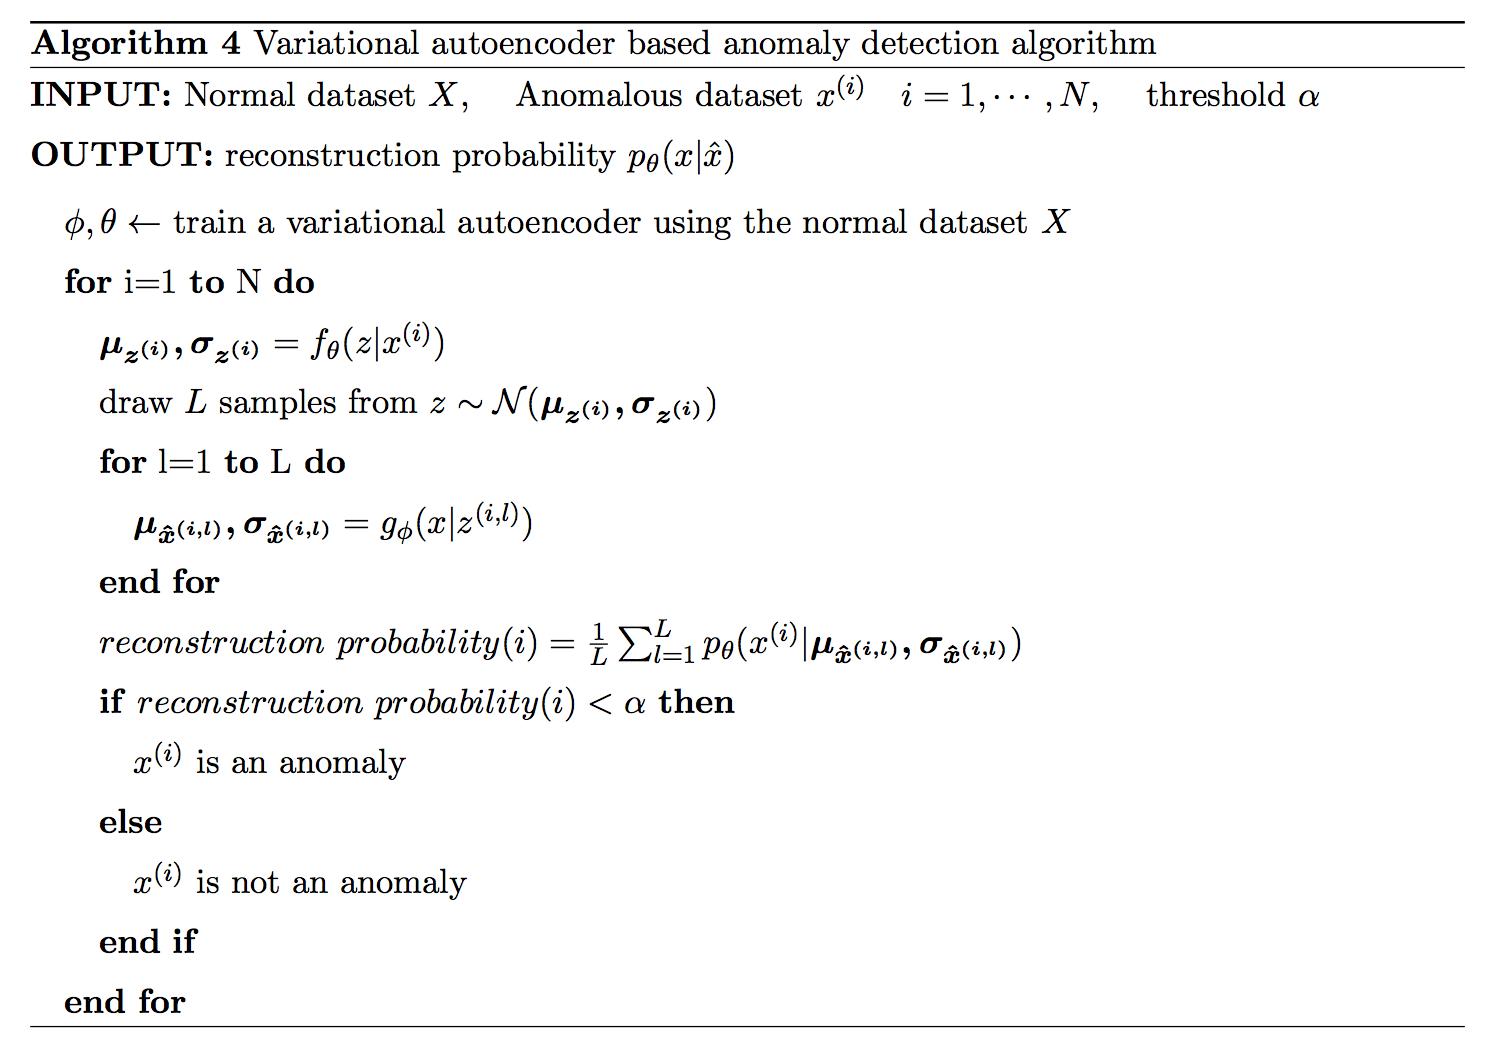 Variational Autoencoder based Anomaly Detection using